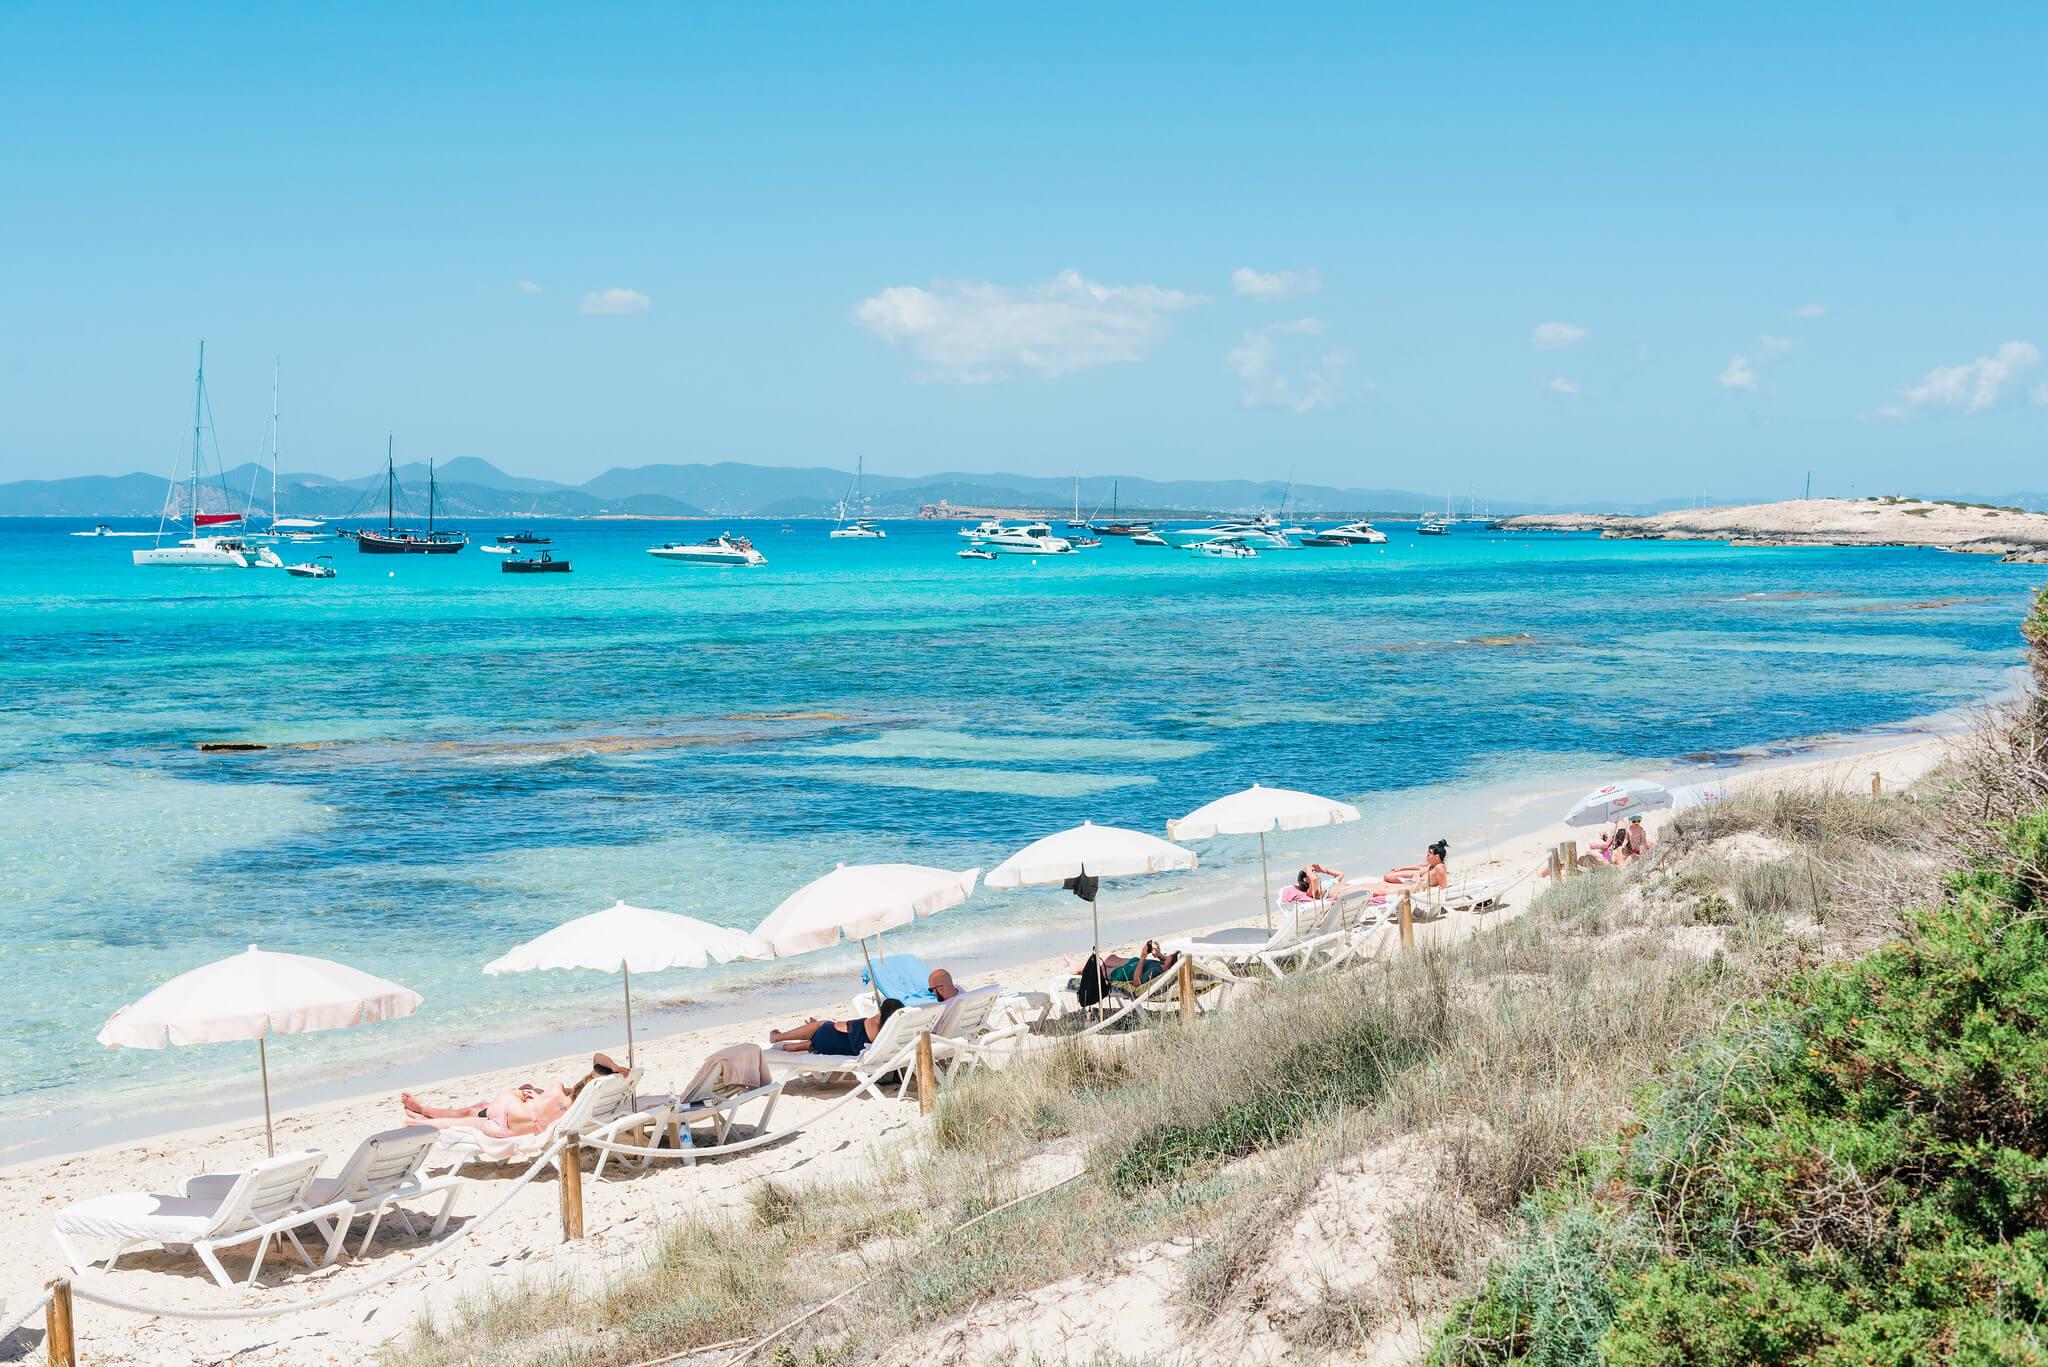 https://www.white-ibiza.com/wp-content/uploads/2020/04/formentera-beaches-illetes-2020-04.jpg